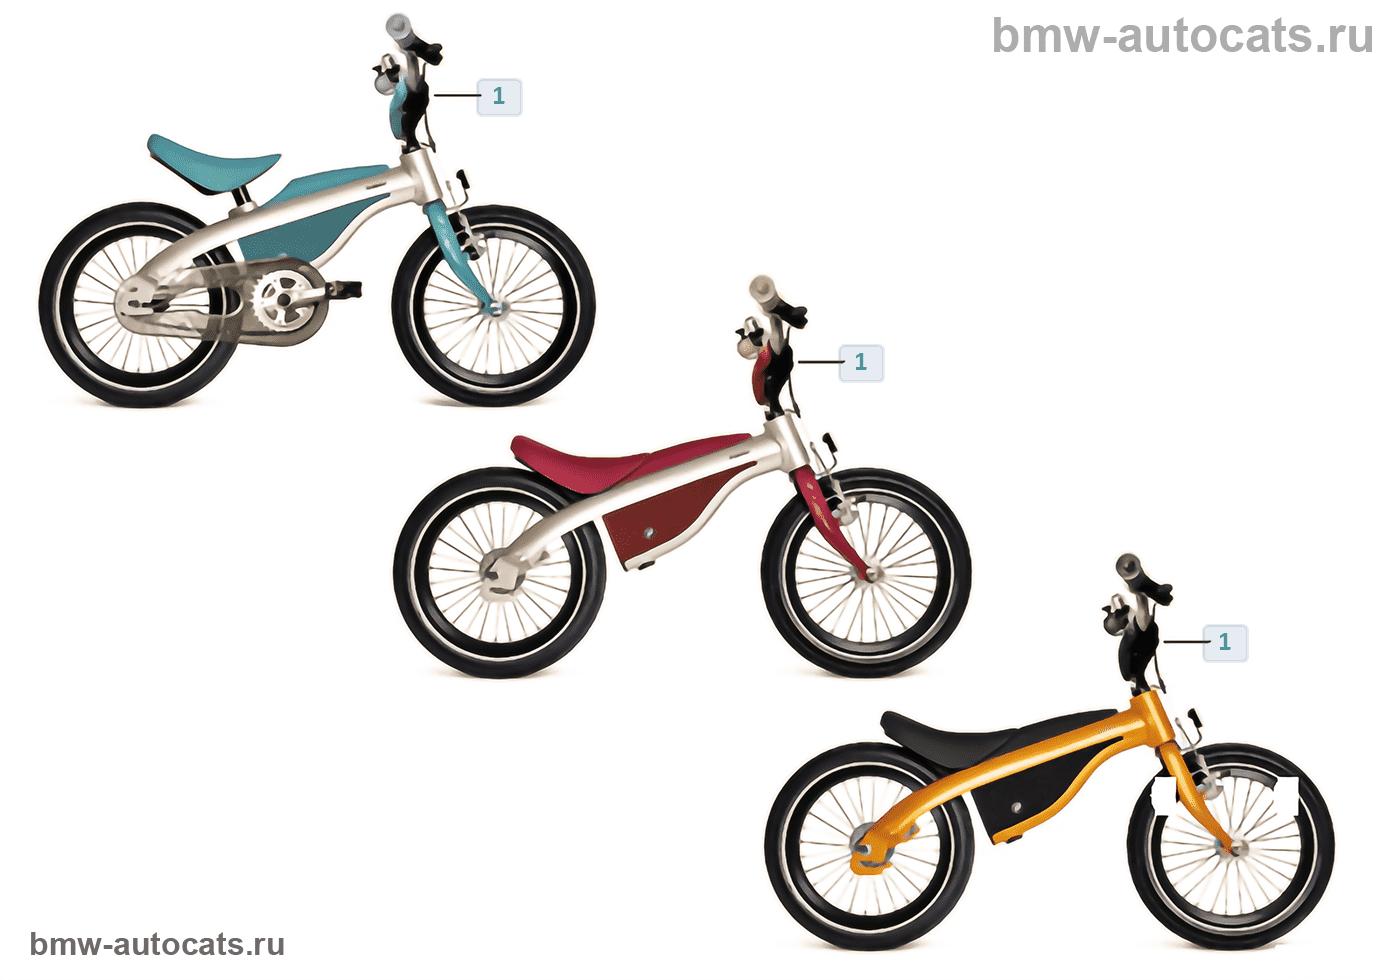 BMW дети — Kidsbike 14-16